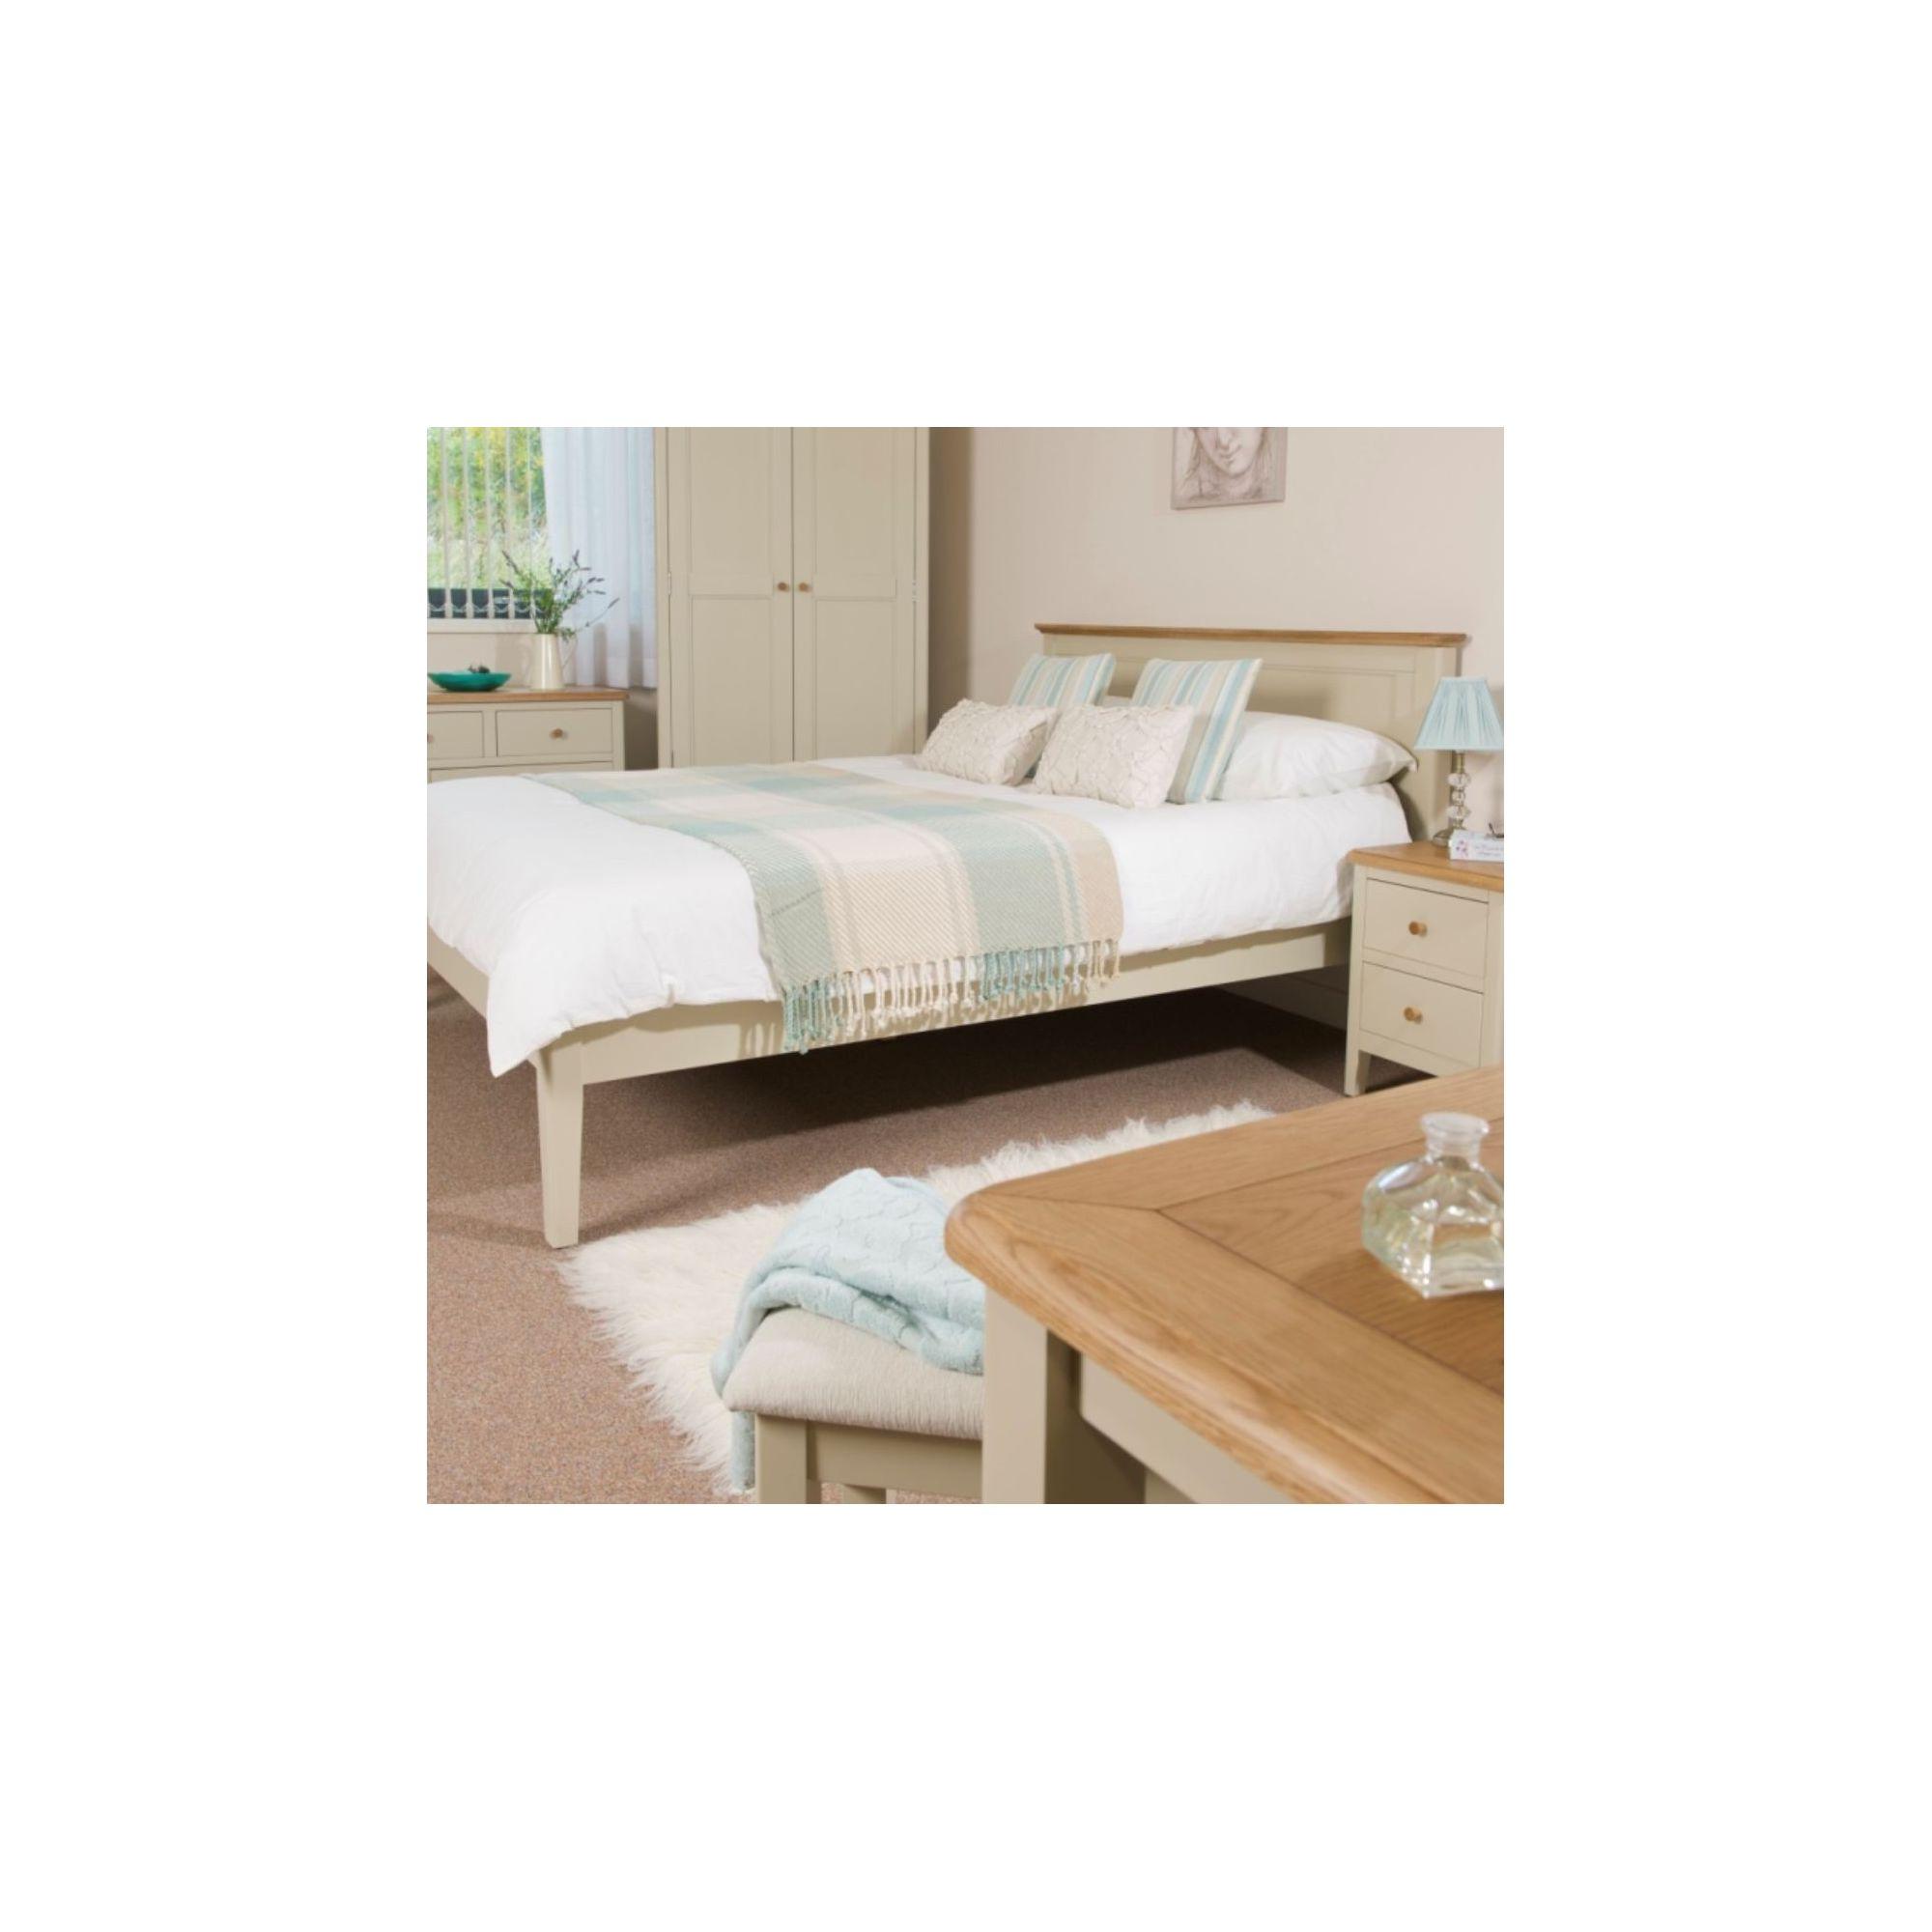 Kelburn Furniture Cottage Painted Bed - King at Tesco Direct